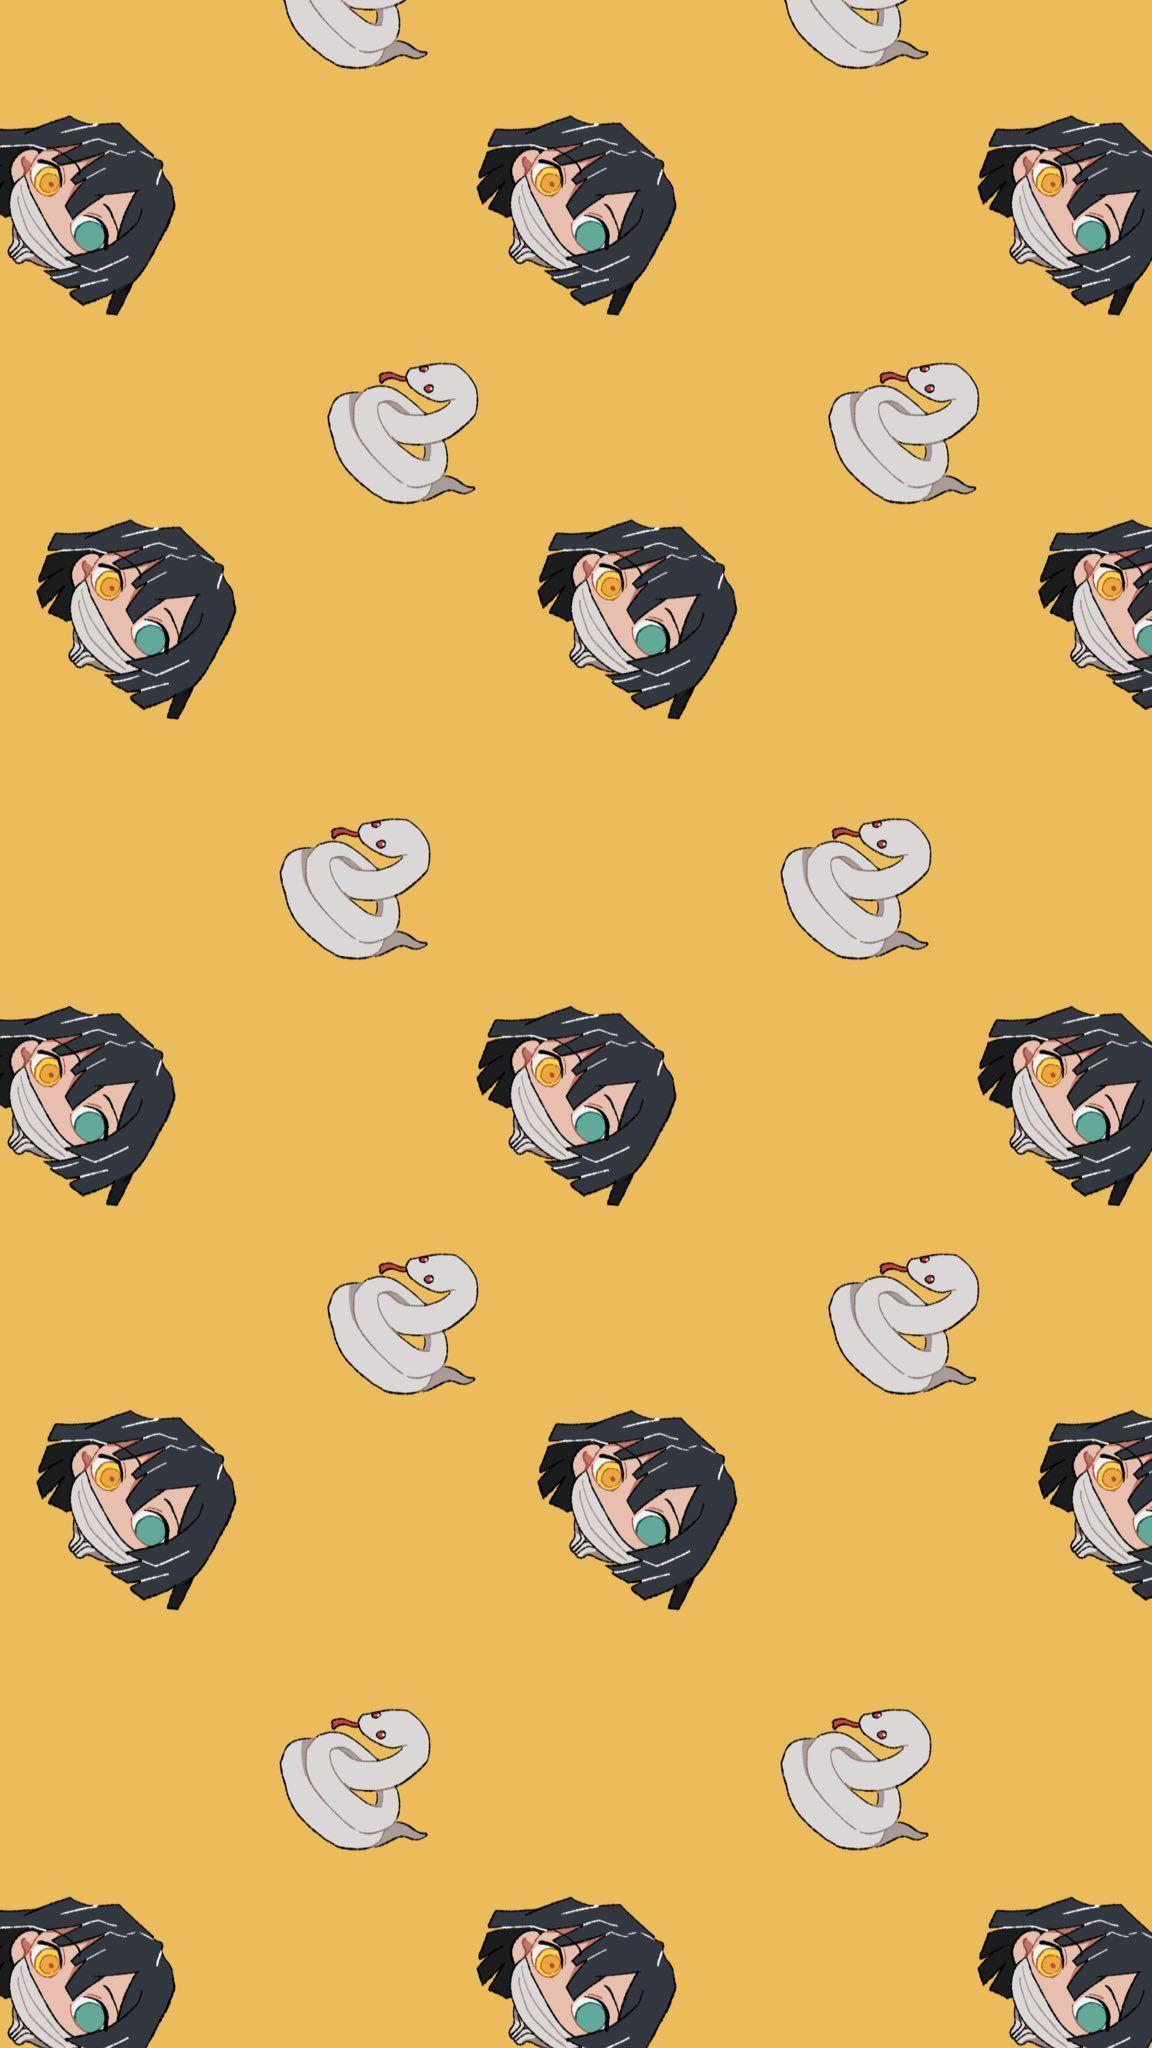 Twitter 鬼滅の刃 壁紙かわいい 癒し アニメ かっこいい 壁紙 アニメ